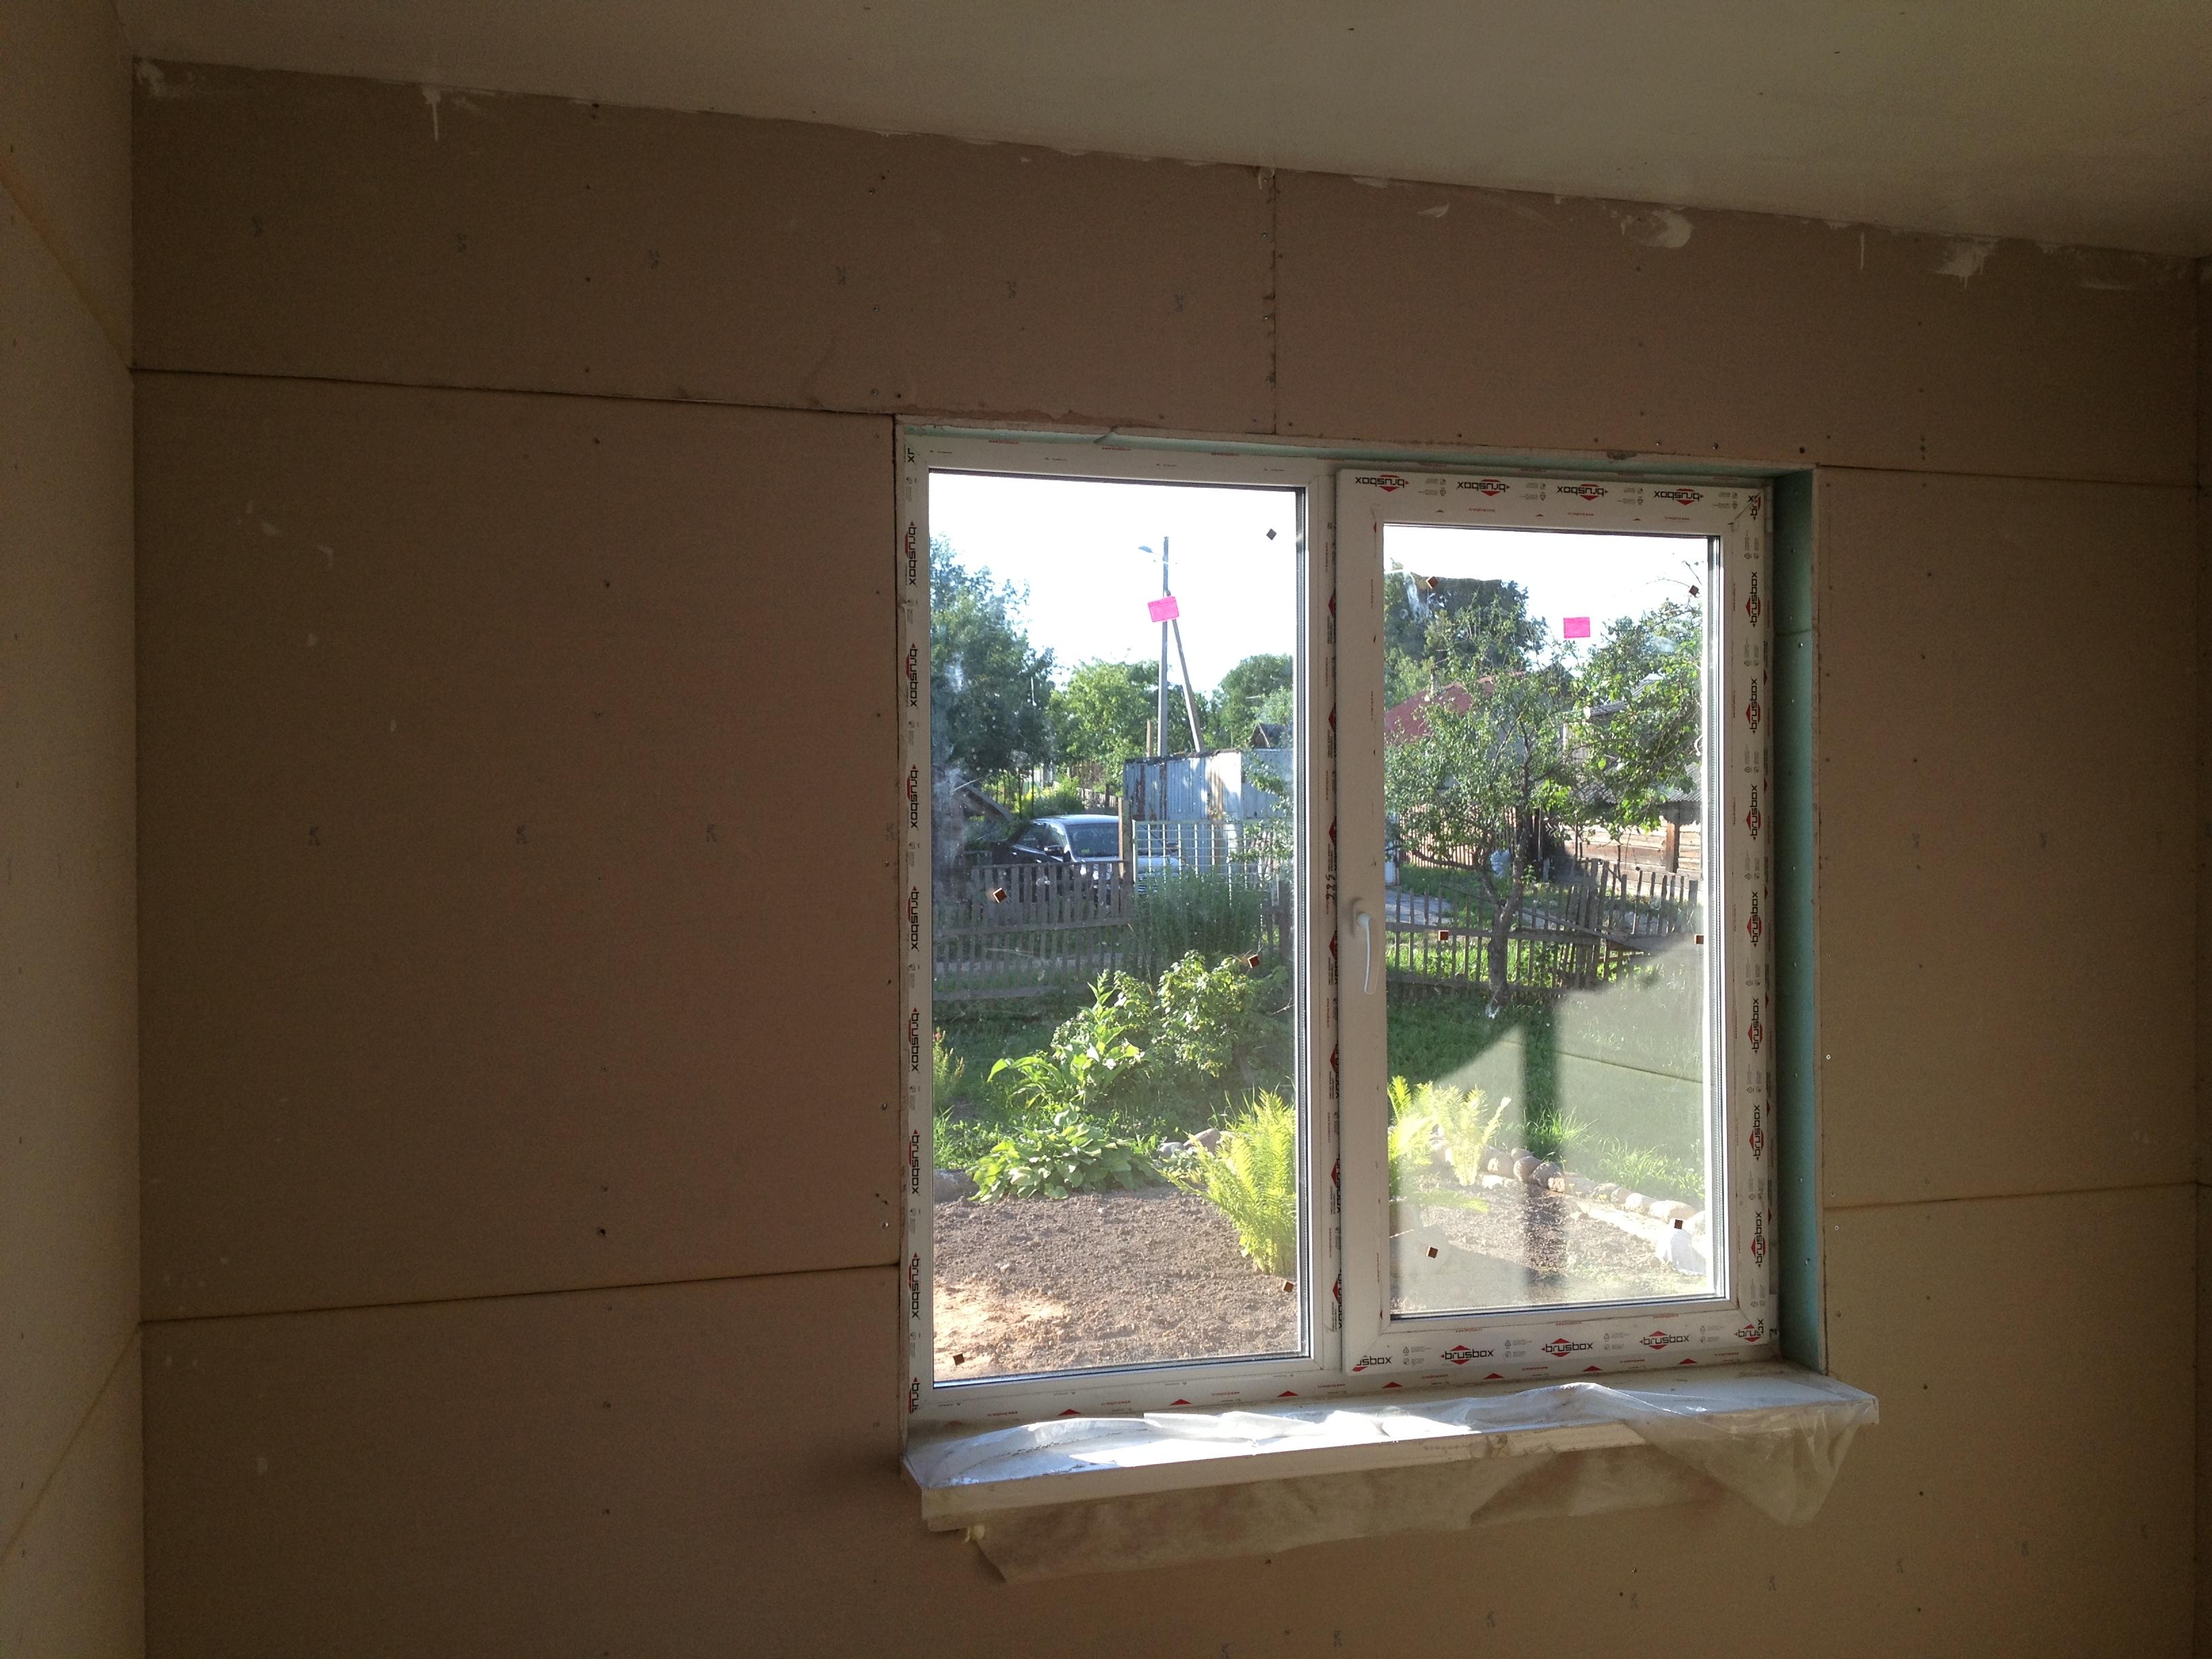 okno-v-dome-iznutri